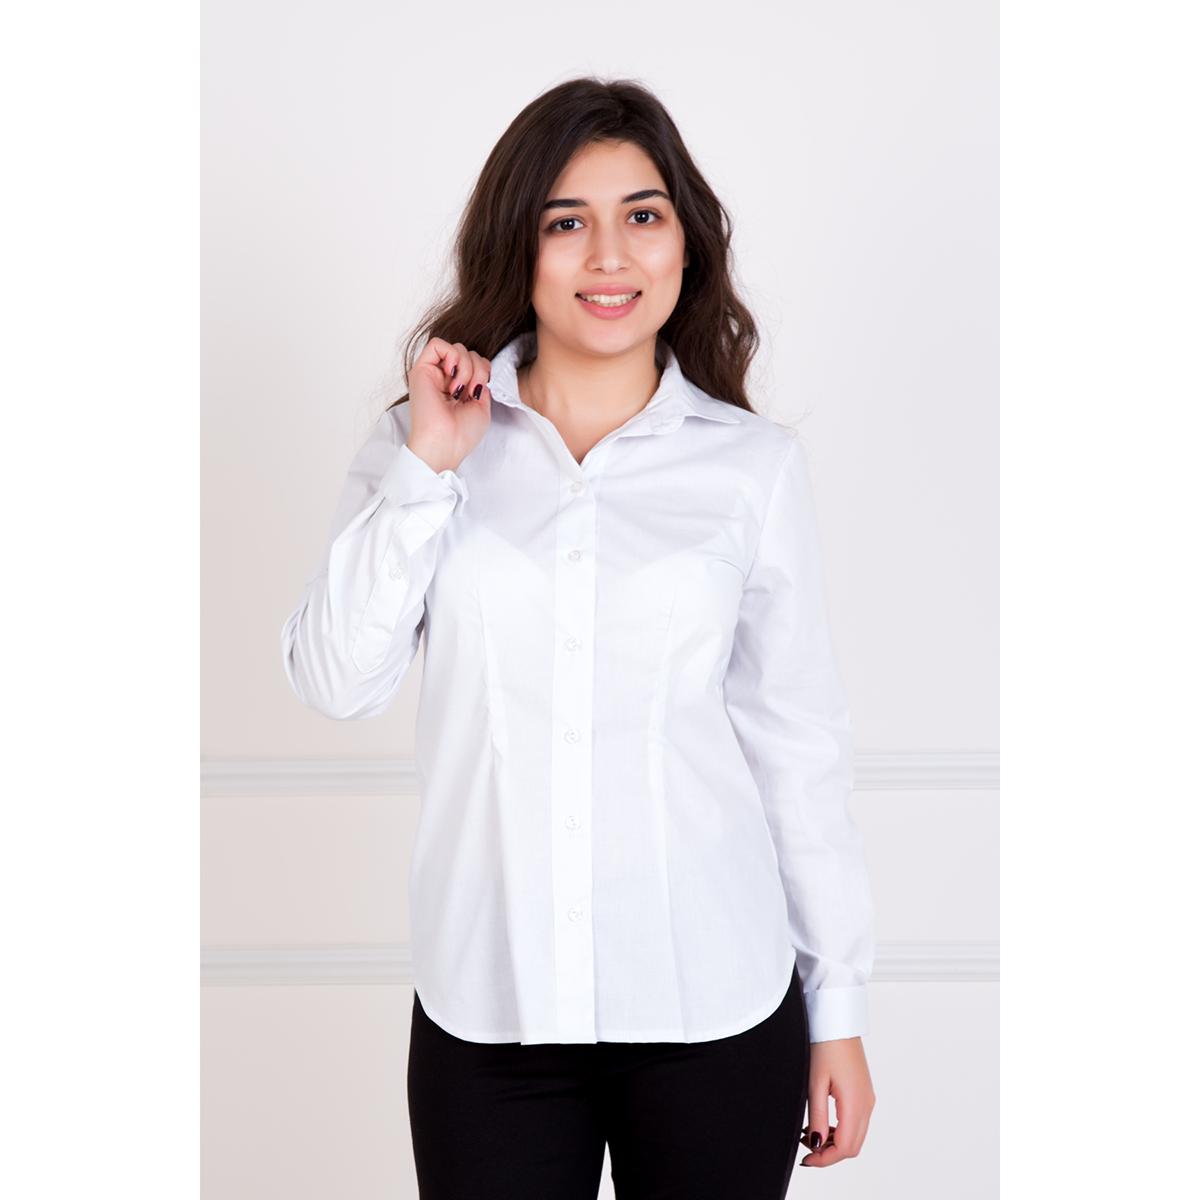 Женская рубашка Герда, размер 54Рубашки<br>Обхват груди: 108 см <br>Обхват талии: 88 см <br>Обхват бедер: 116 см <br>Рост: 167 см<br><br>Тип: Жен. рубашка<br>Размер: 54<br>Материал: Хлопок